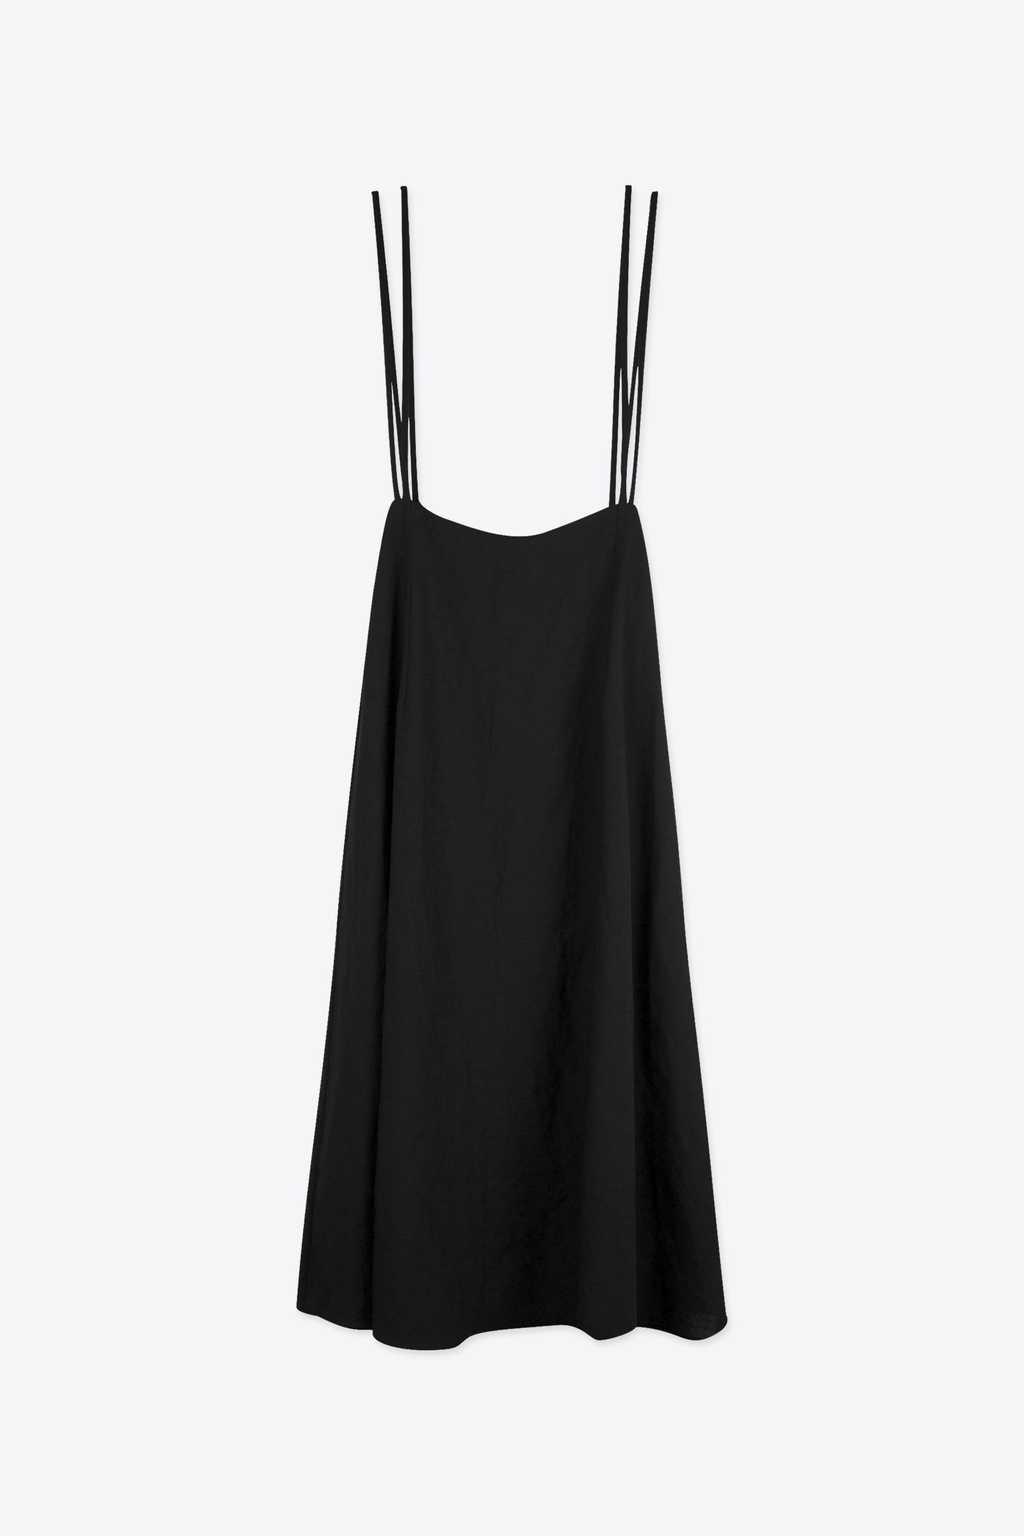 Dress H185 Black 9